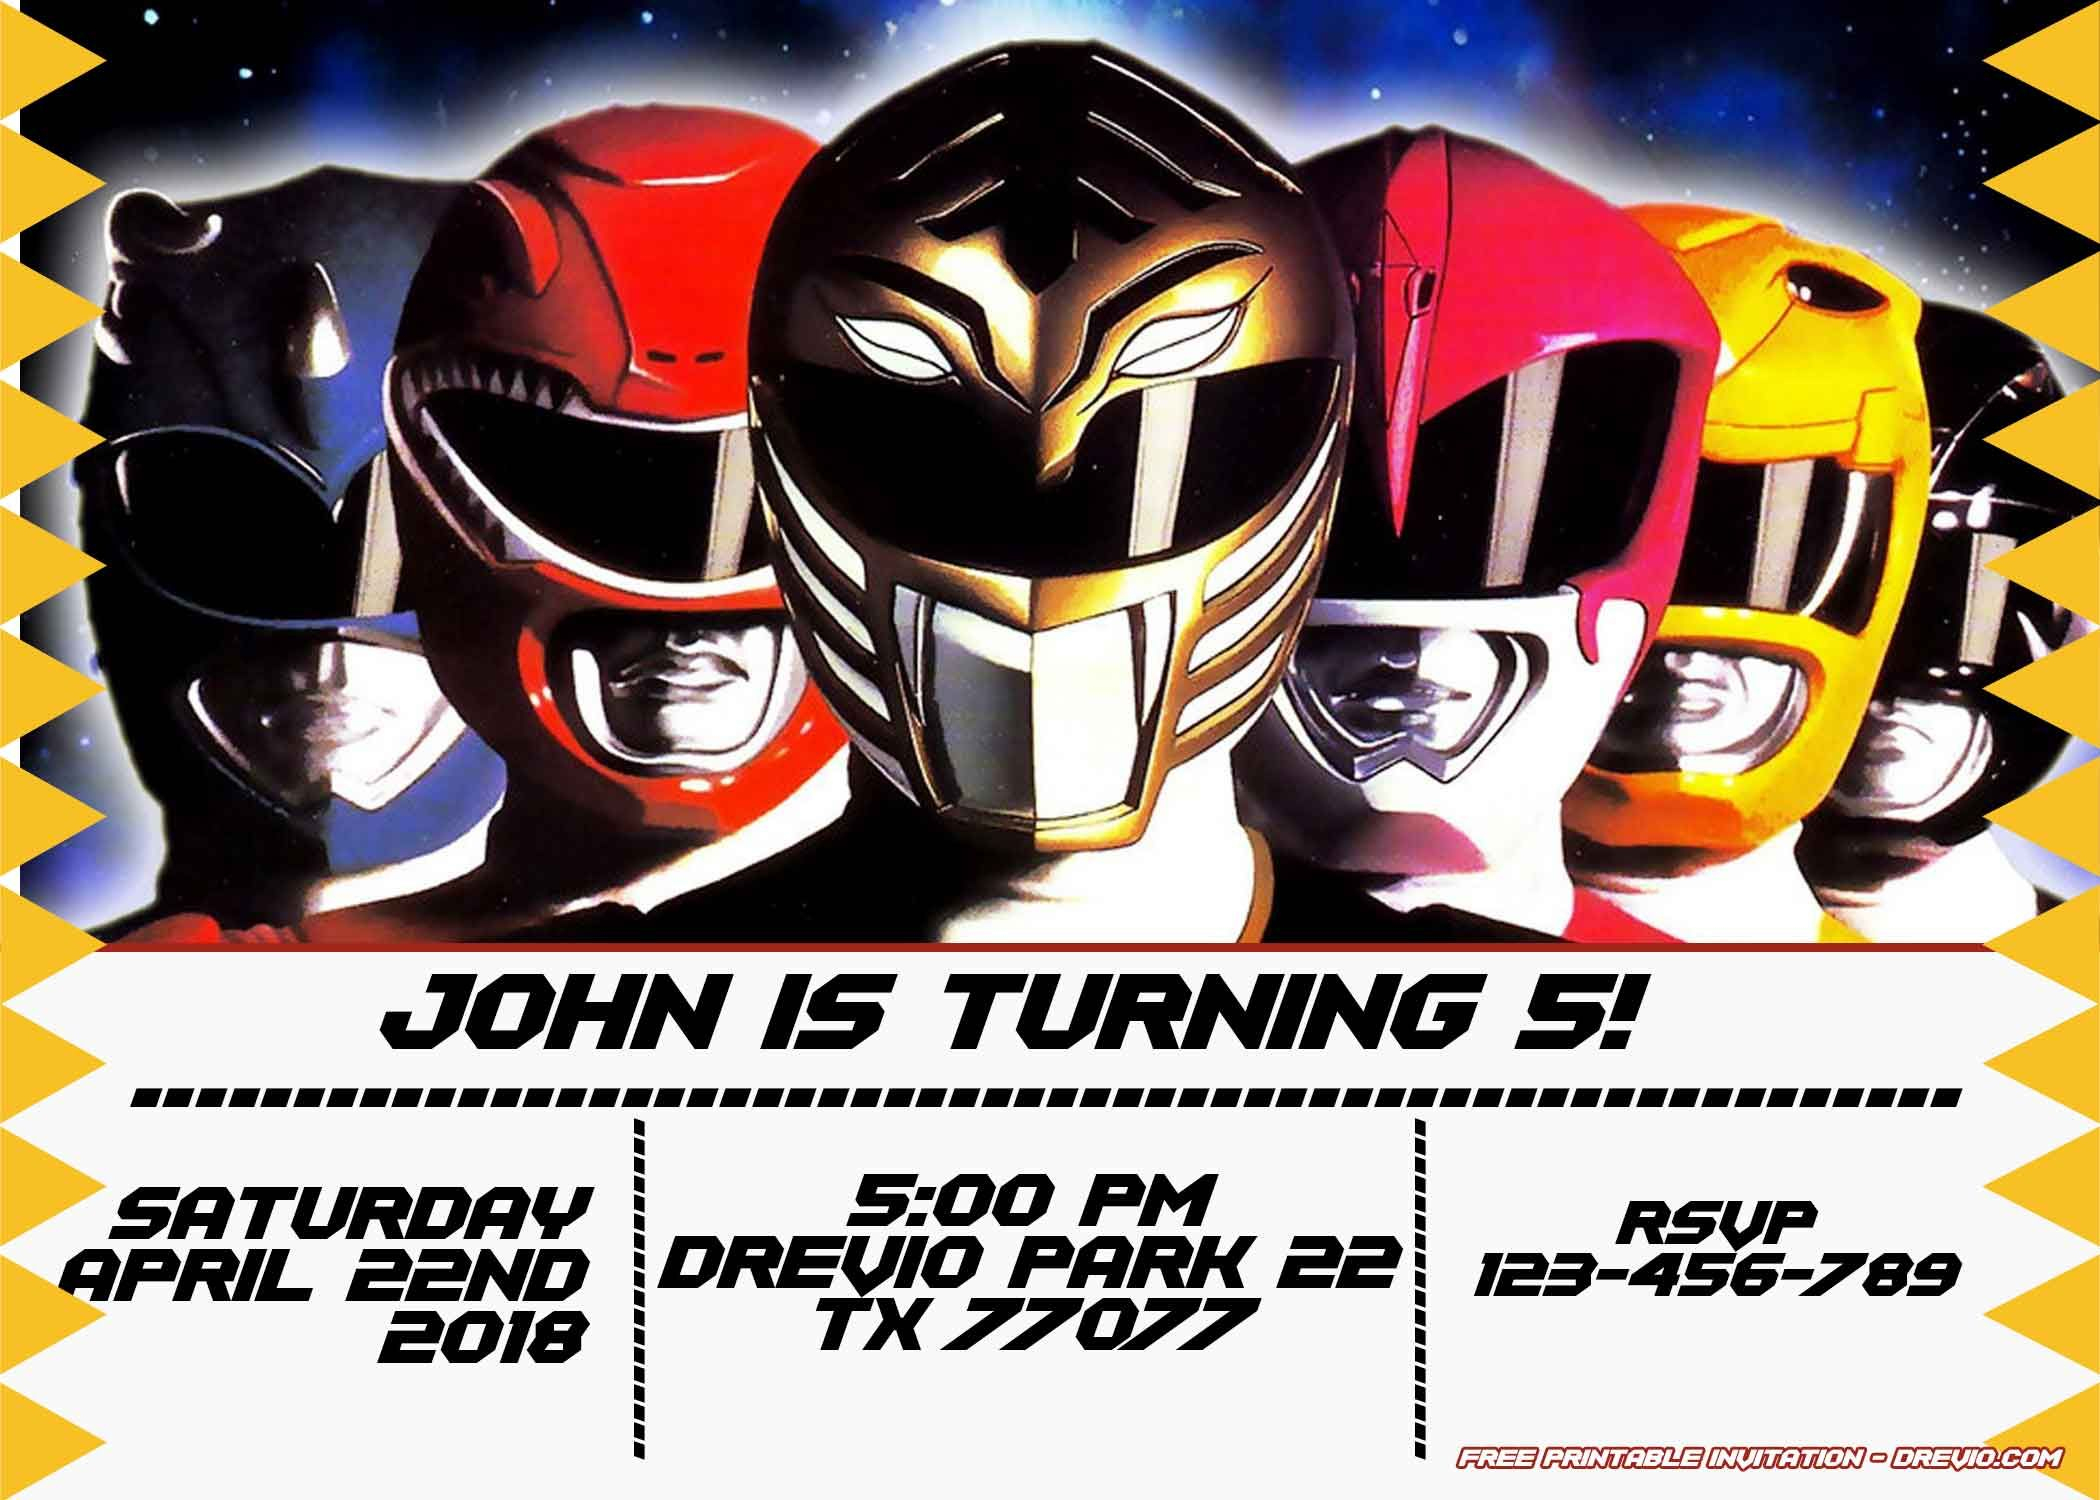 Free Power Rangers Birthday Invitation | Life's A Party - Free Printable Power Ranger Birthday Invitations